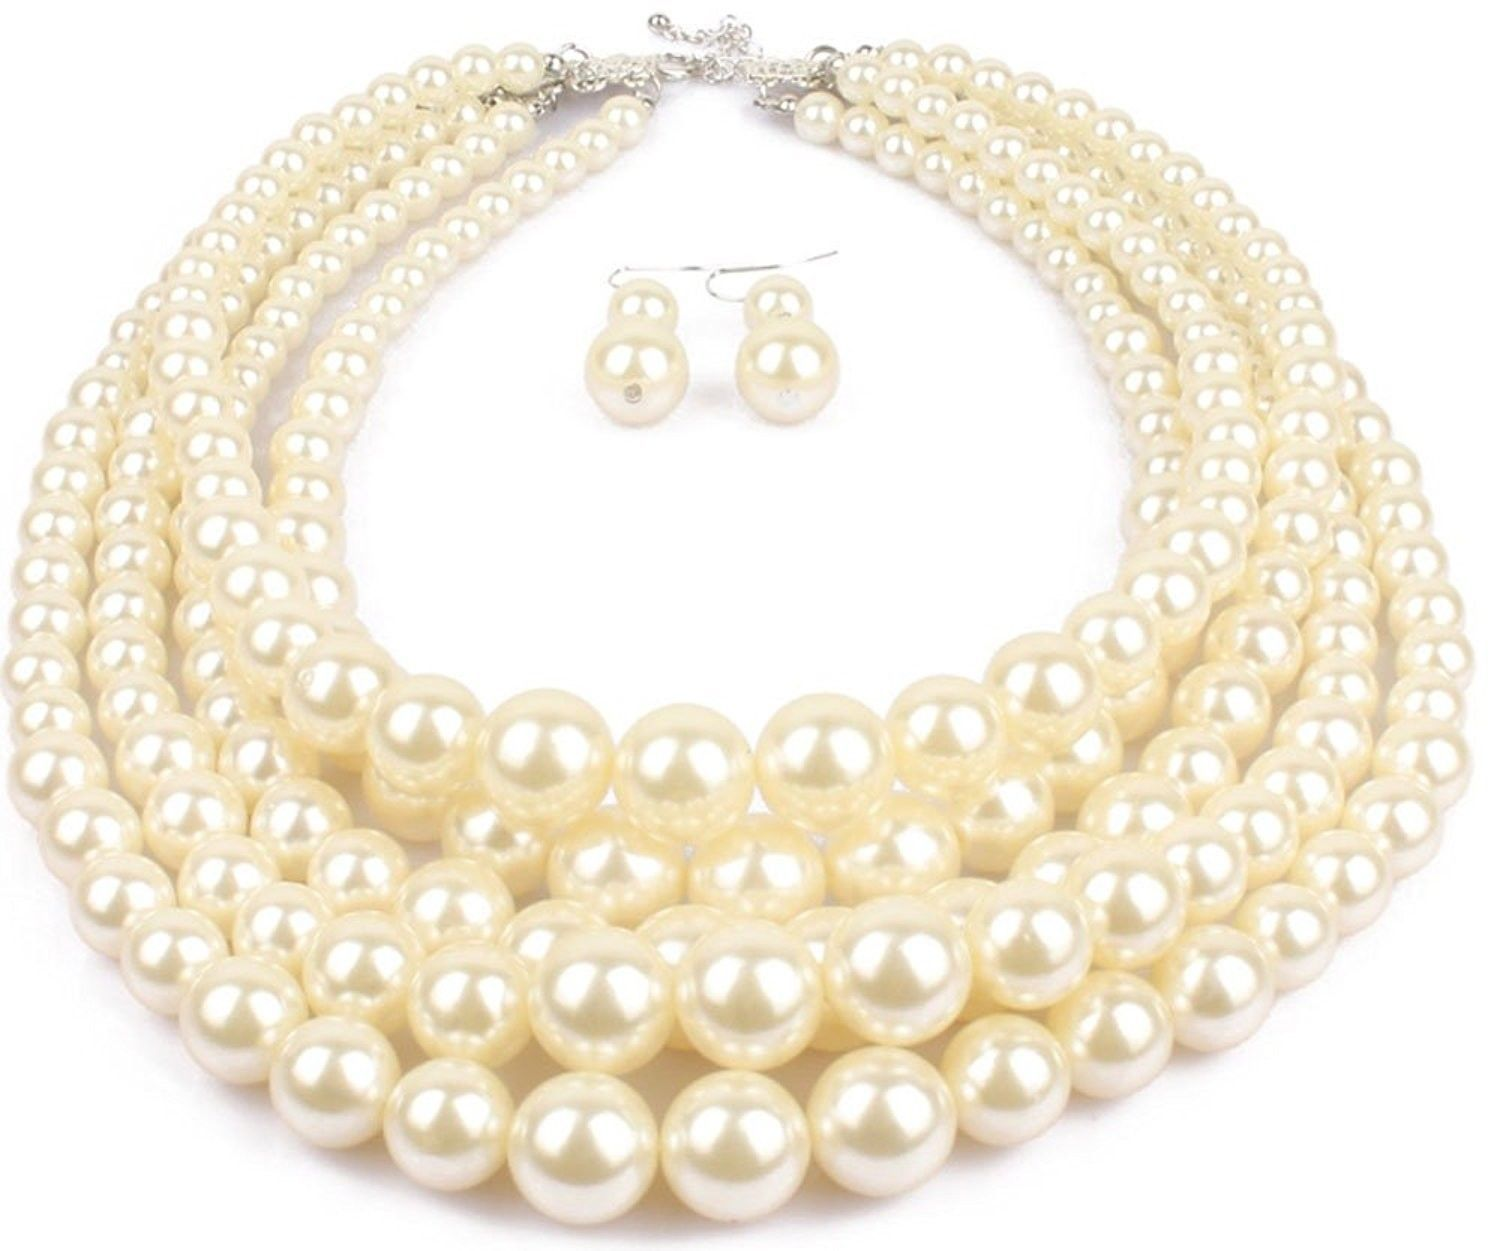 Shineland Elegant 5-laryered Multi-Strand Pearl Cluster Collar Bib Choker